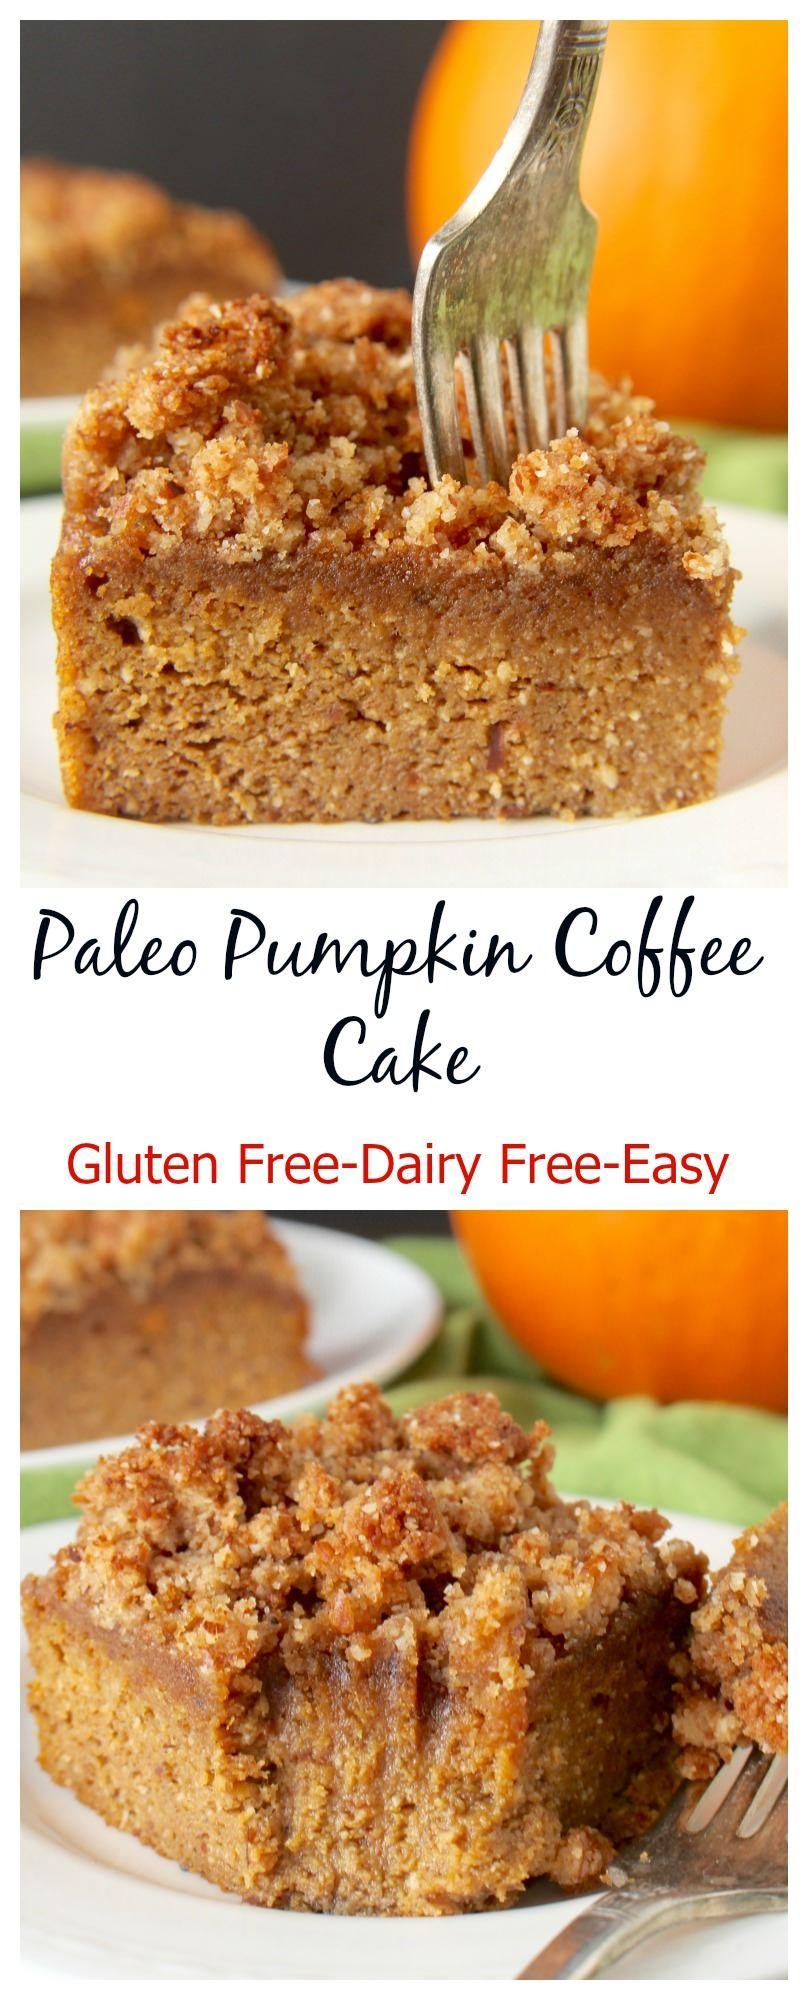 Paleo Pumpkin Coffee Cake Paleo pumpkin recipes, Paleo